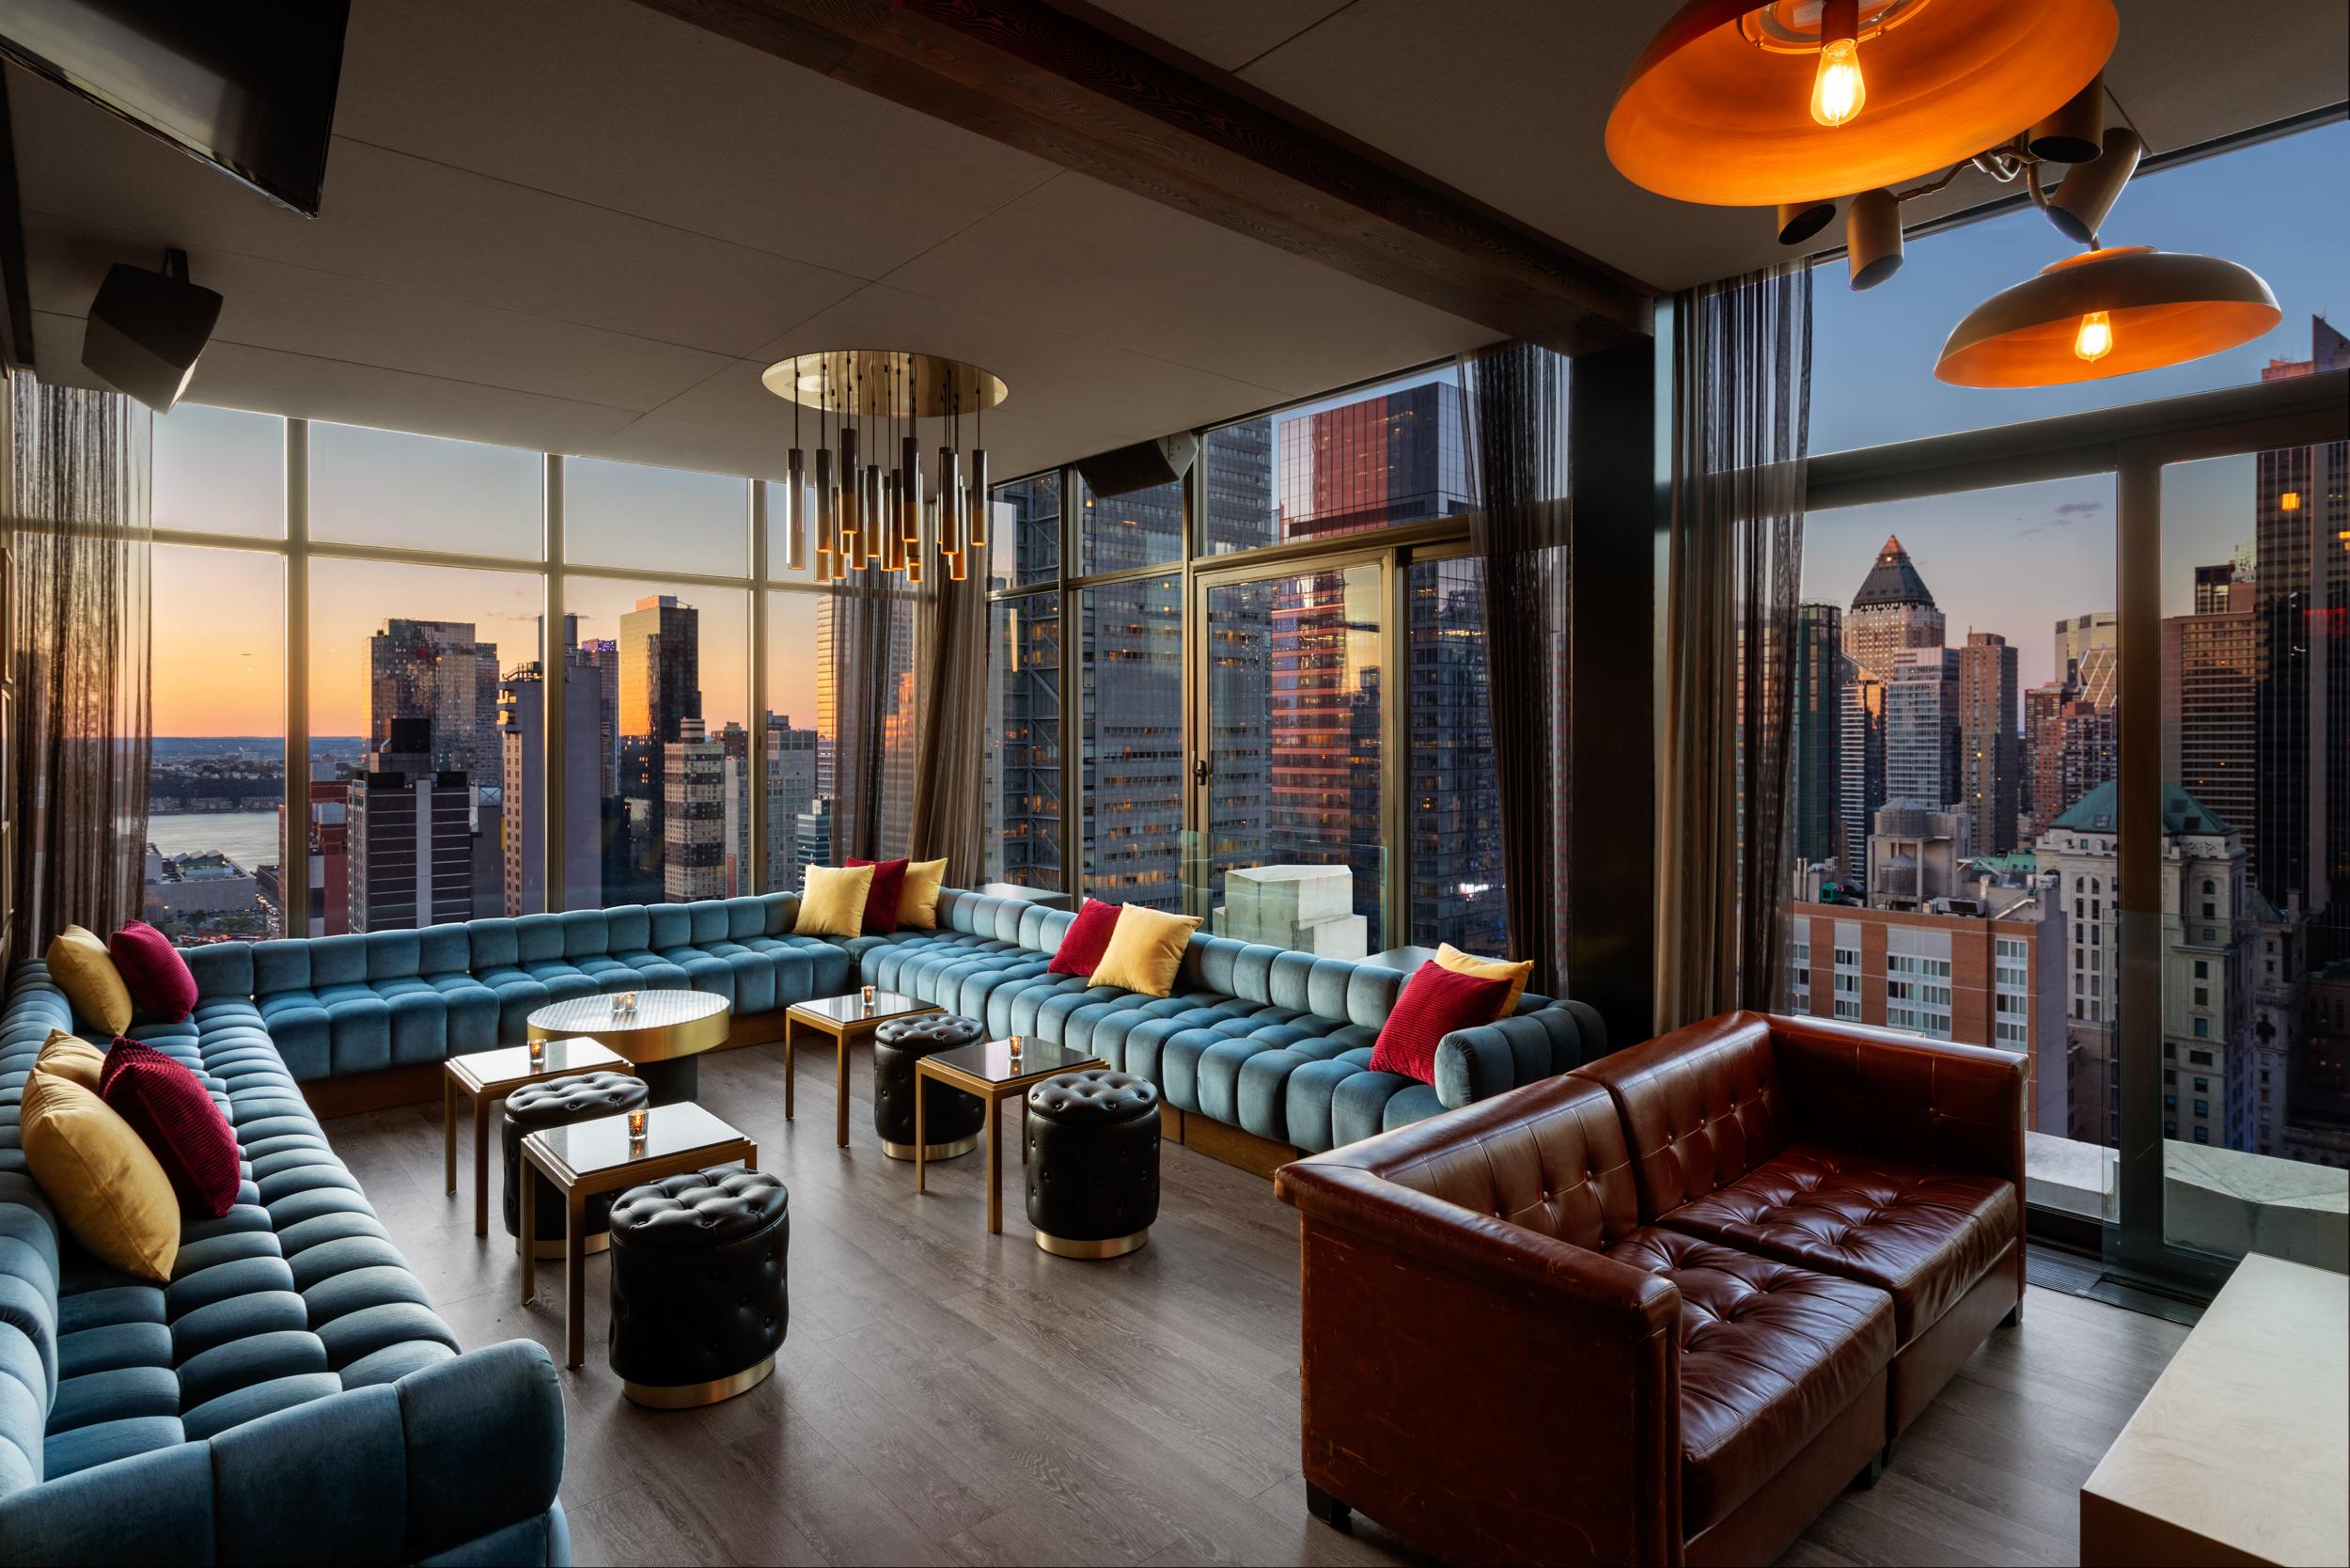 skylark main lounge with sunset city views